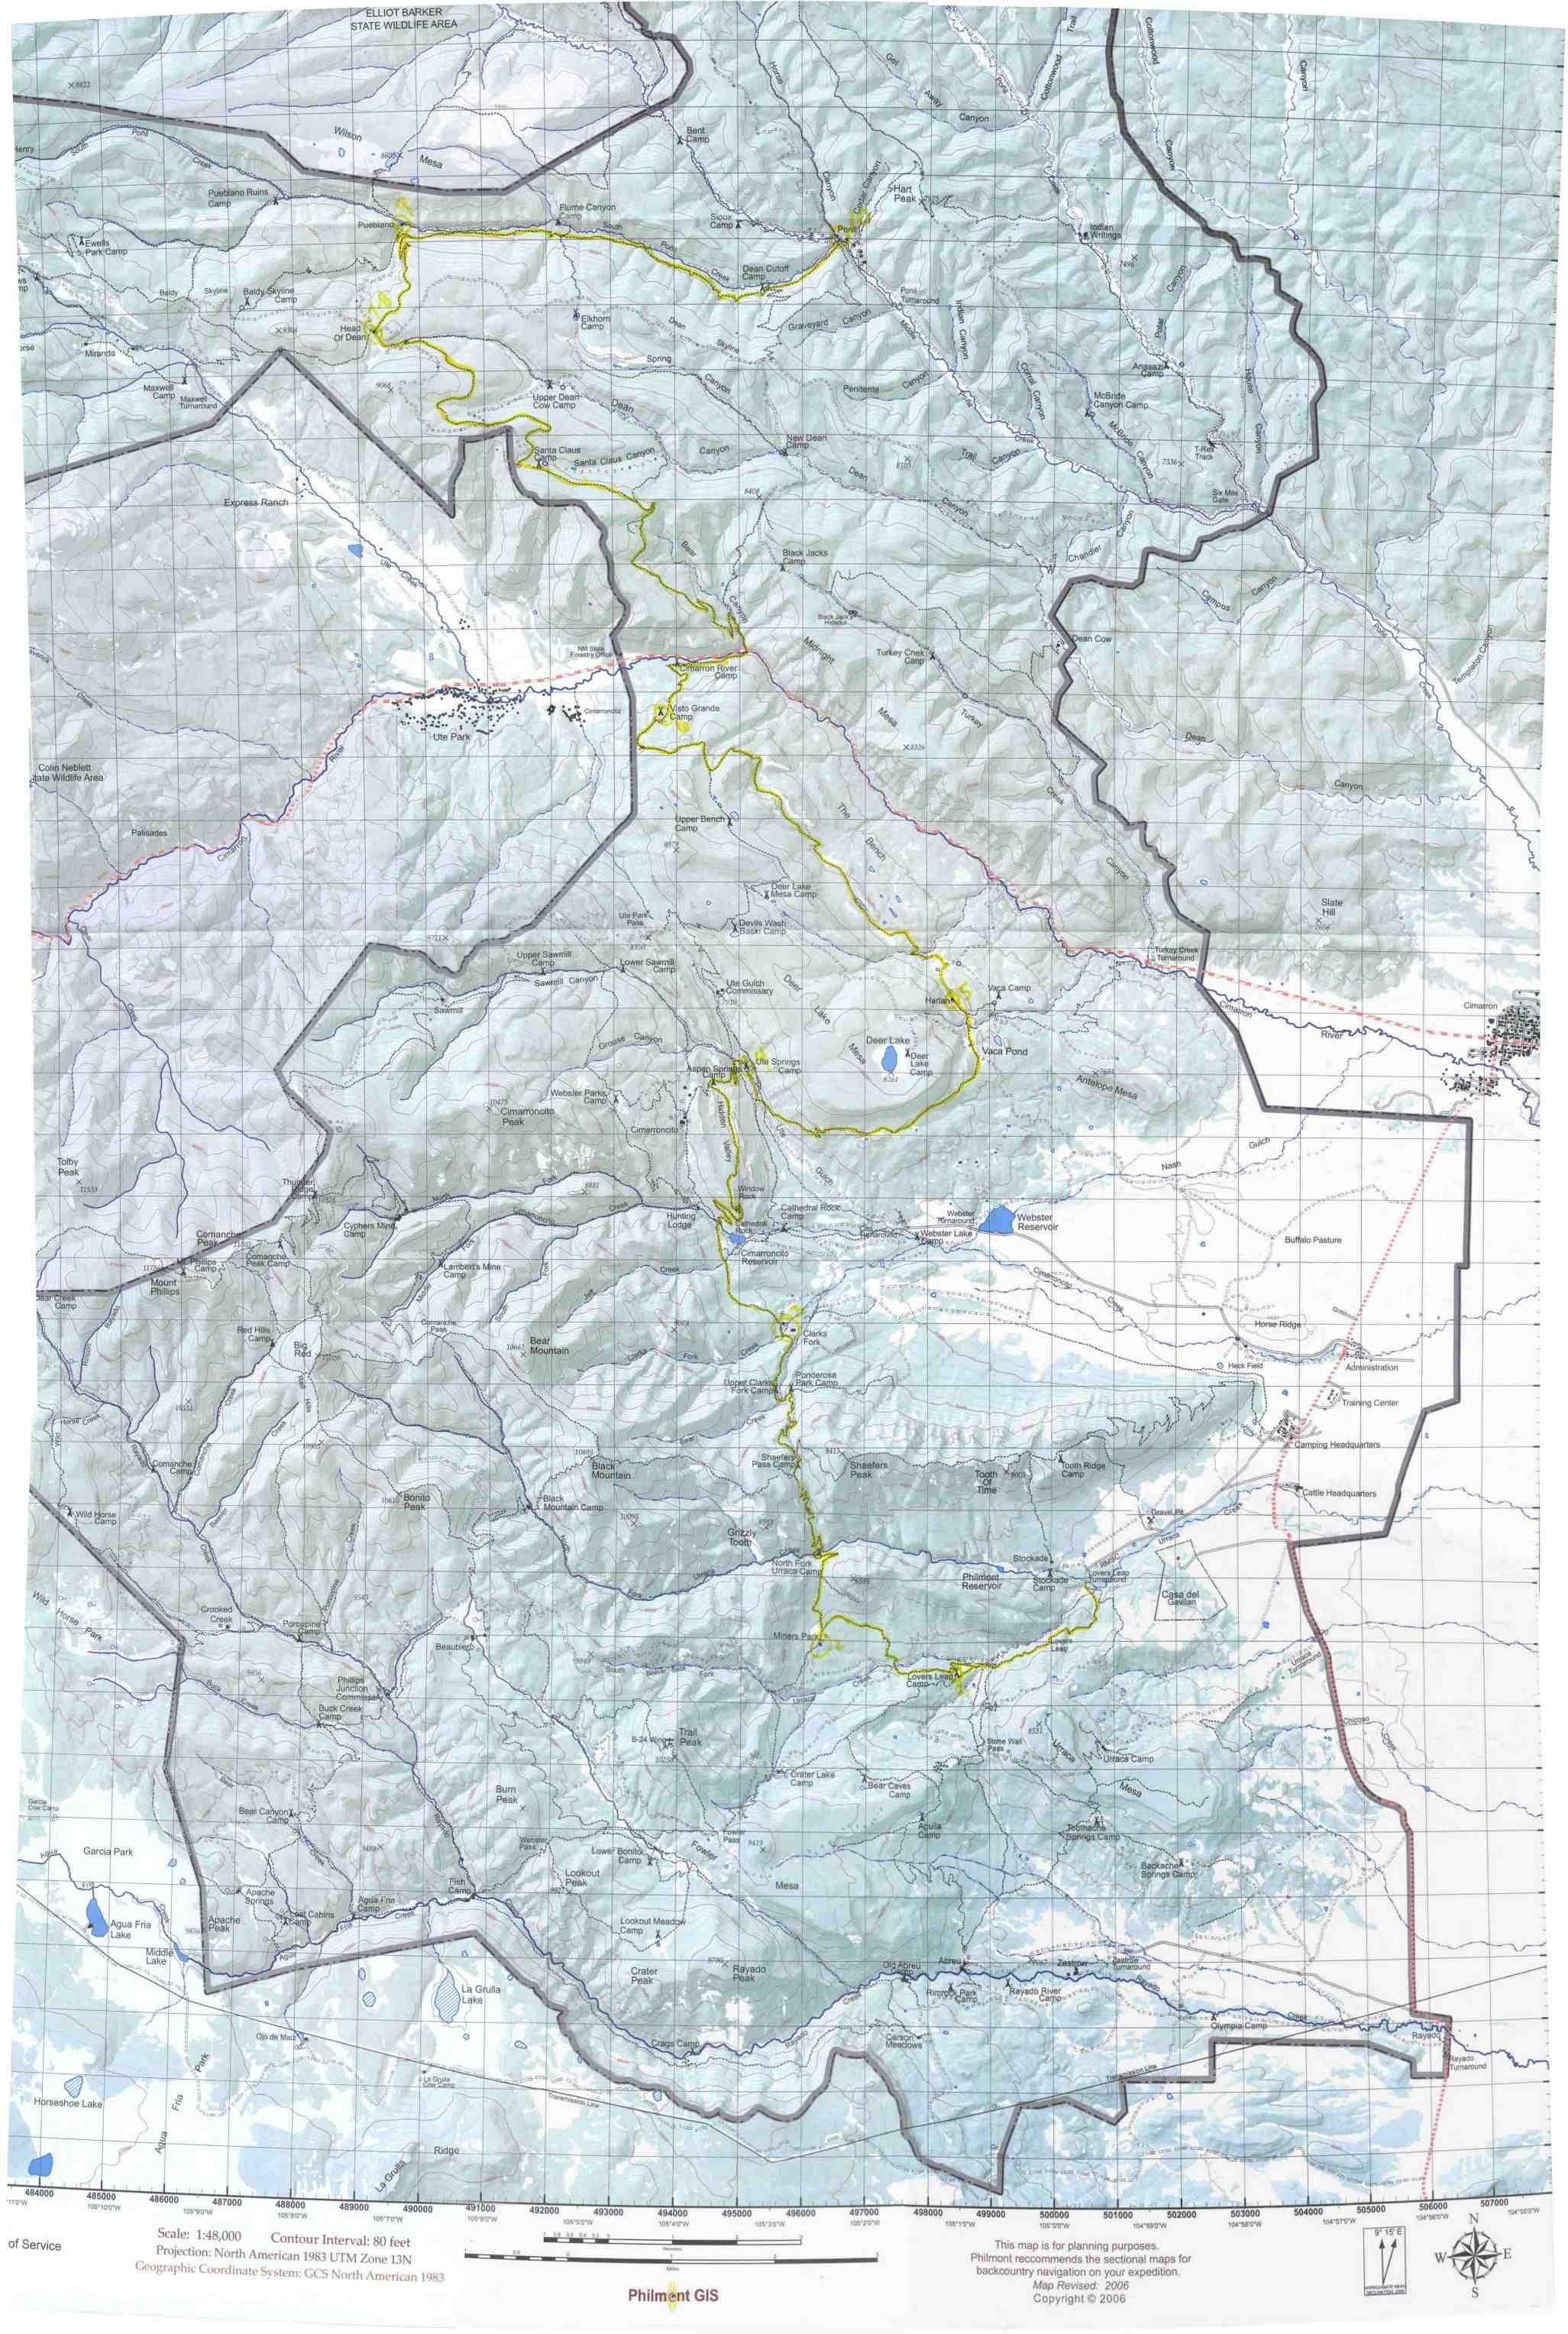 Philmont New Mexico Map.Philmont Trek 20 Map Maps Pinterest Map Trek And Trail